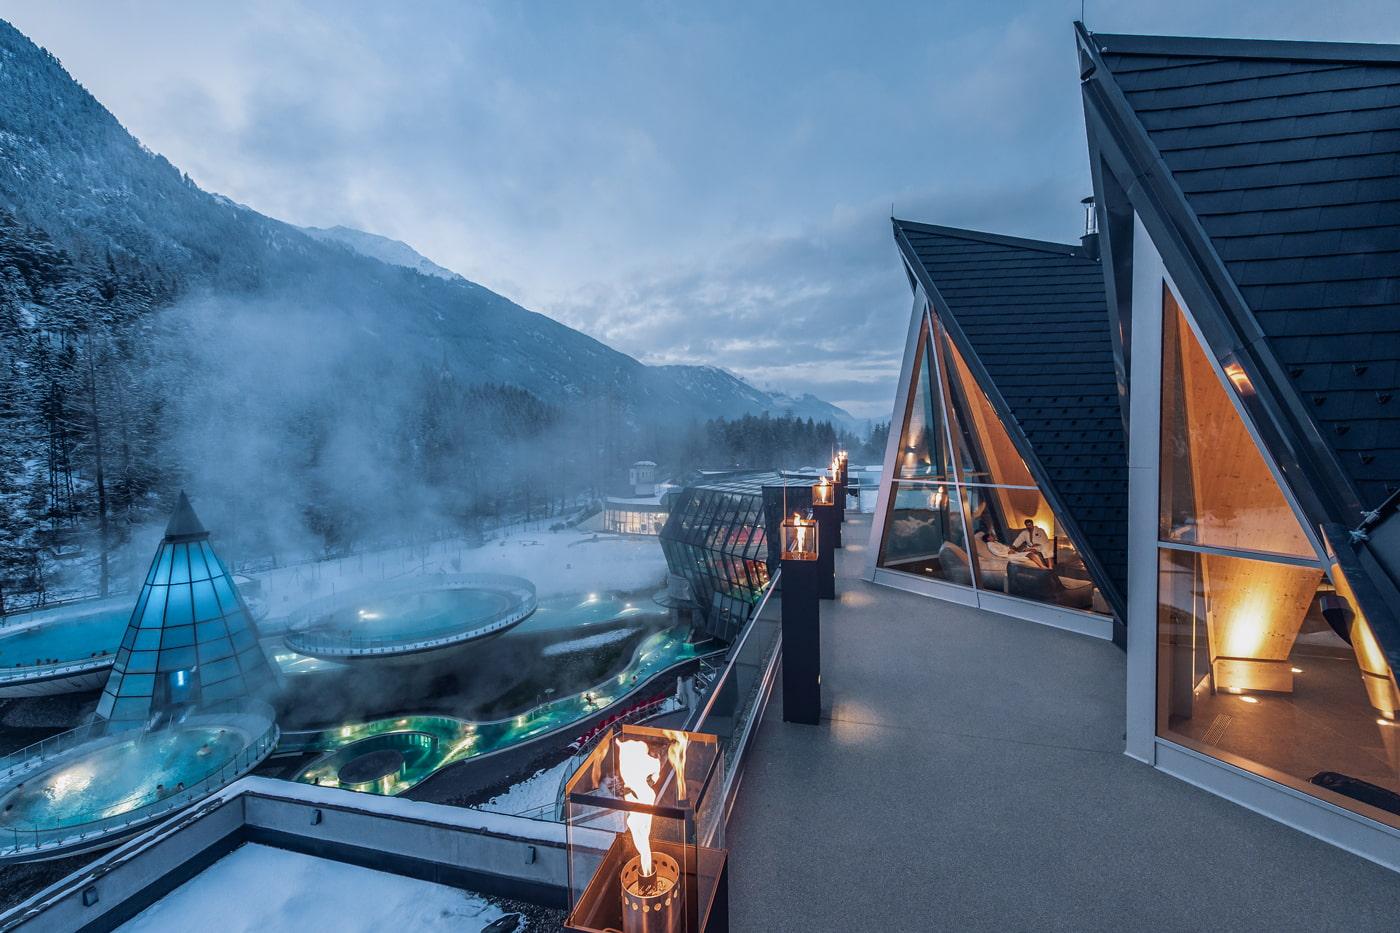 Alpine Spa in Austria